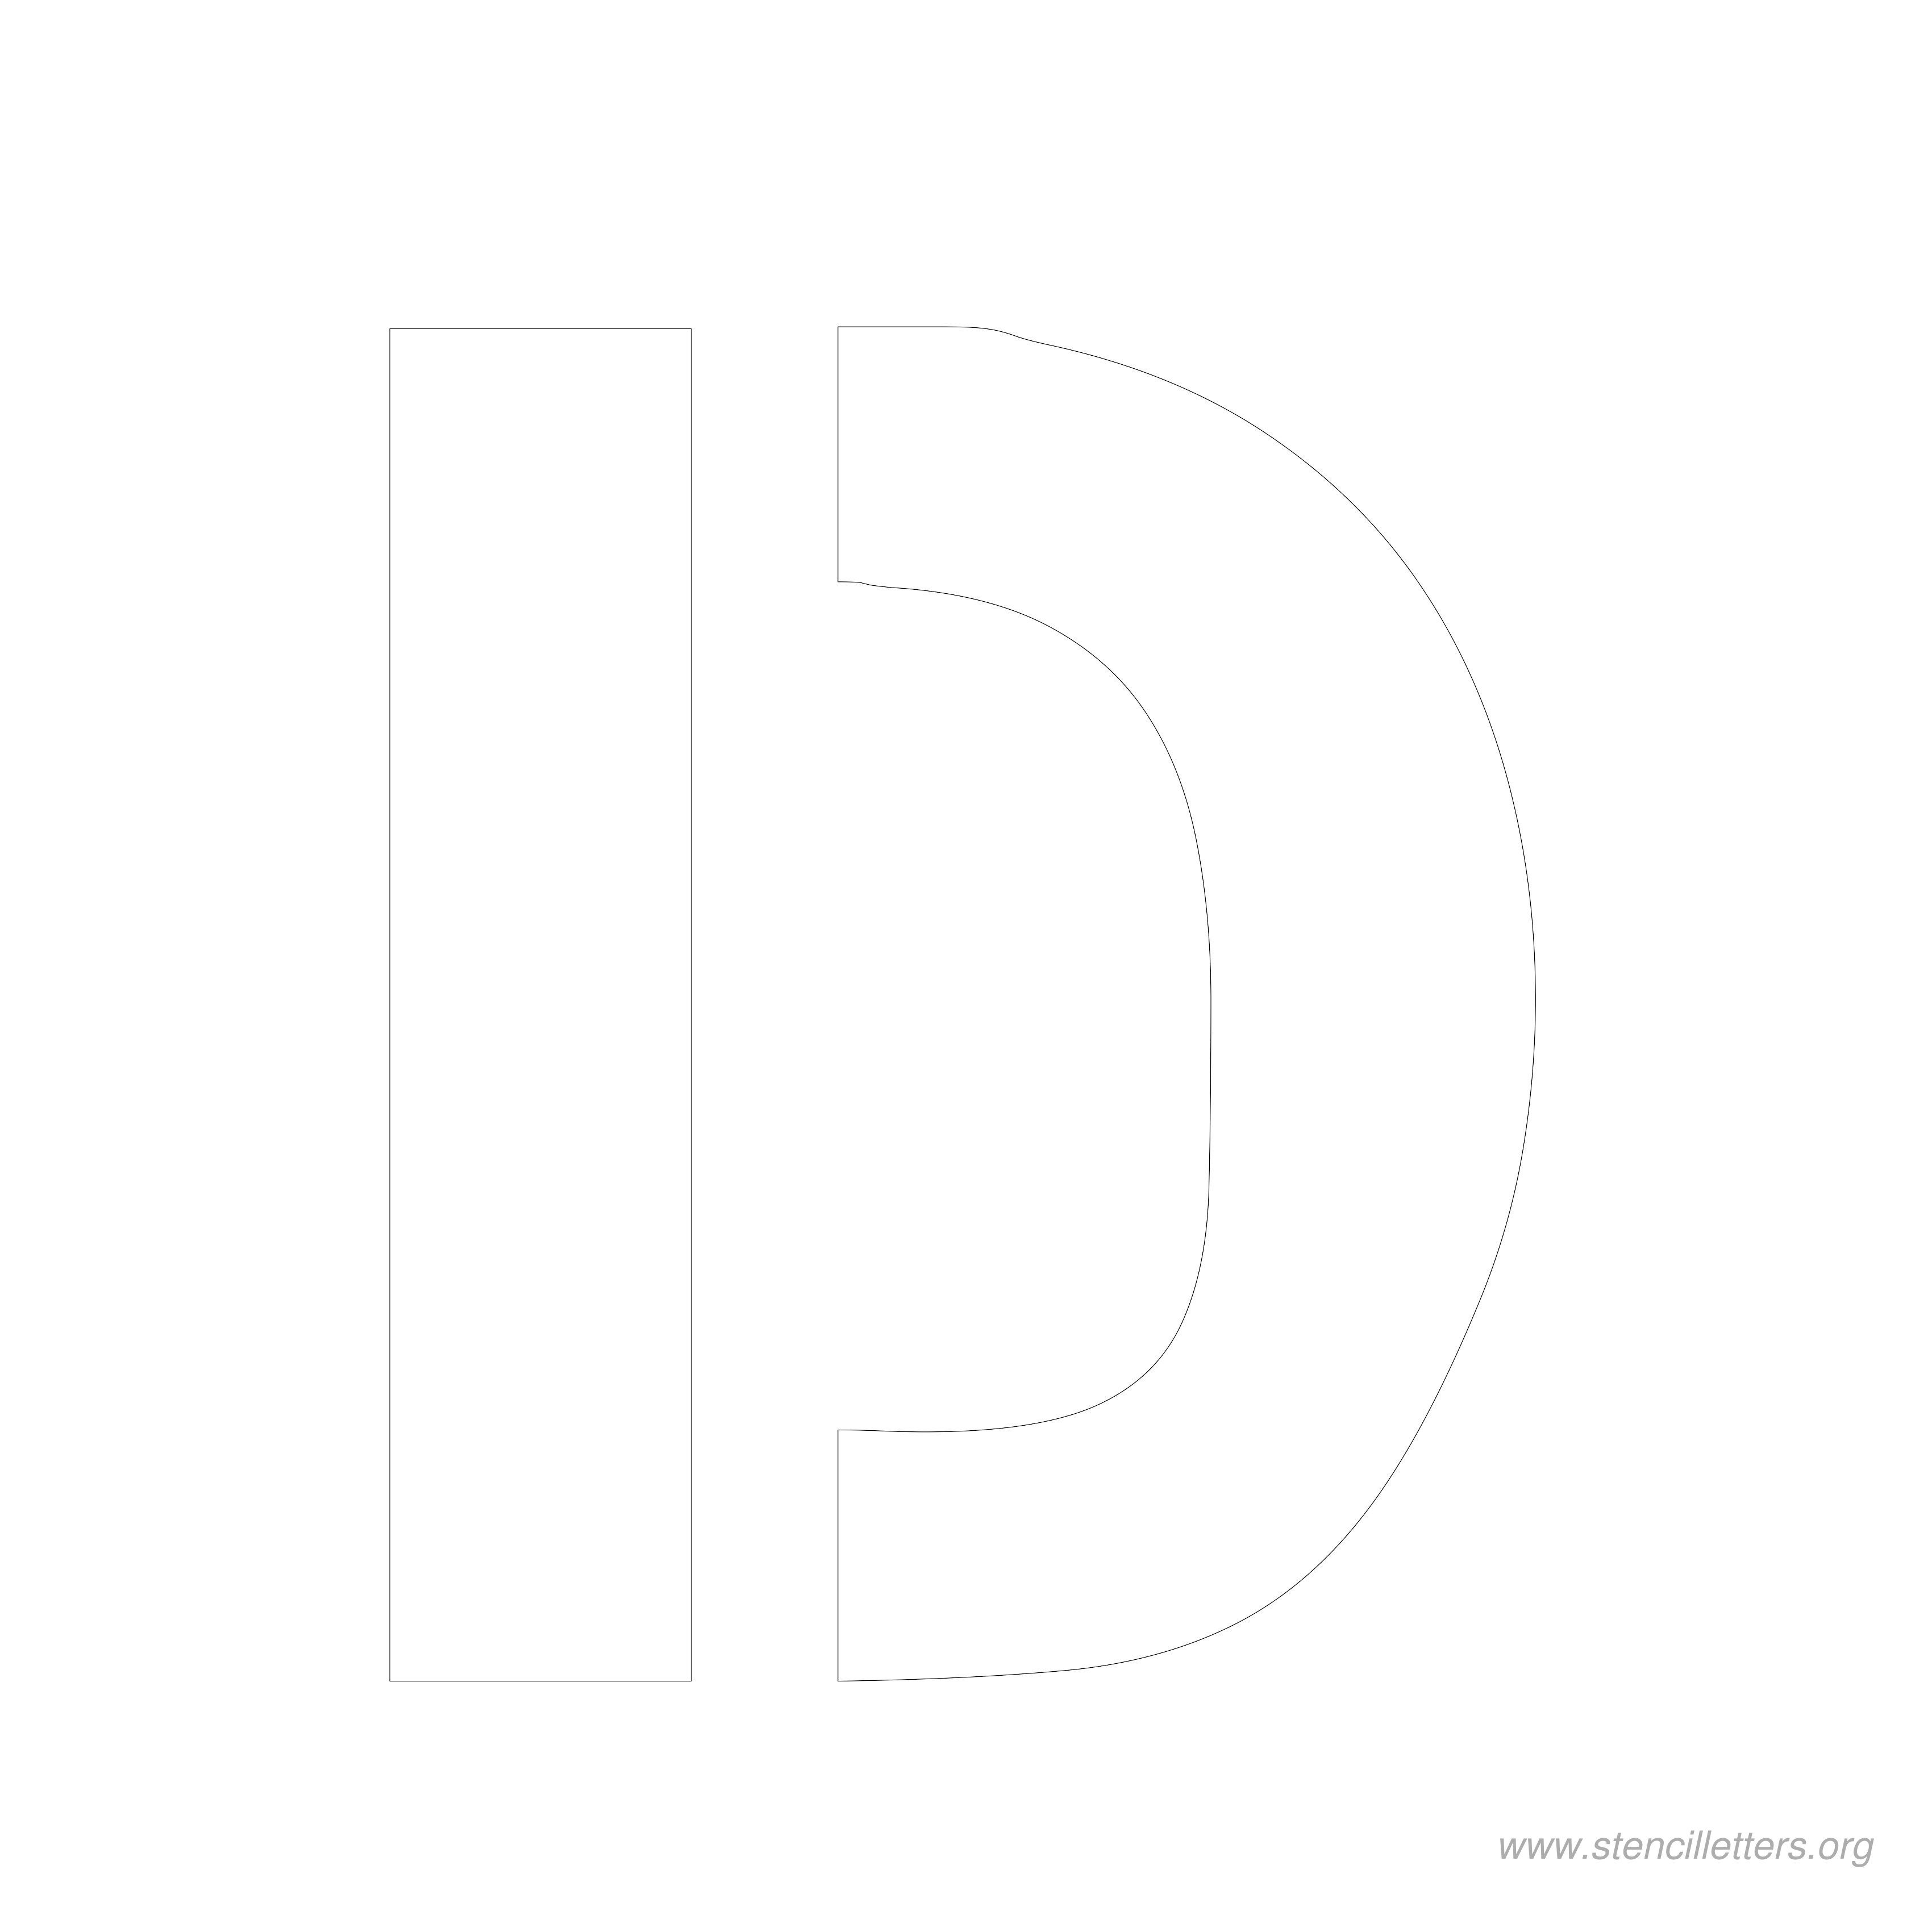 8 Inch Stencil Letter D Letter Stencils Free Printable Letter Stencils Letter Stencils Printables